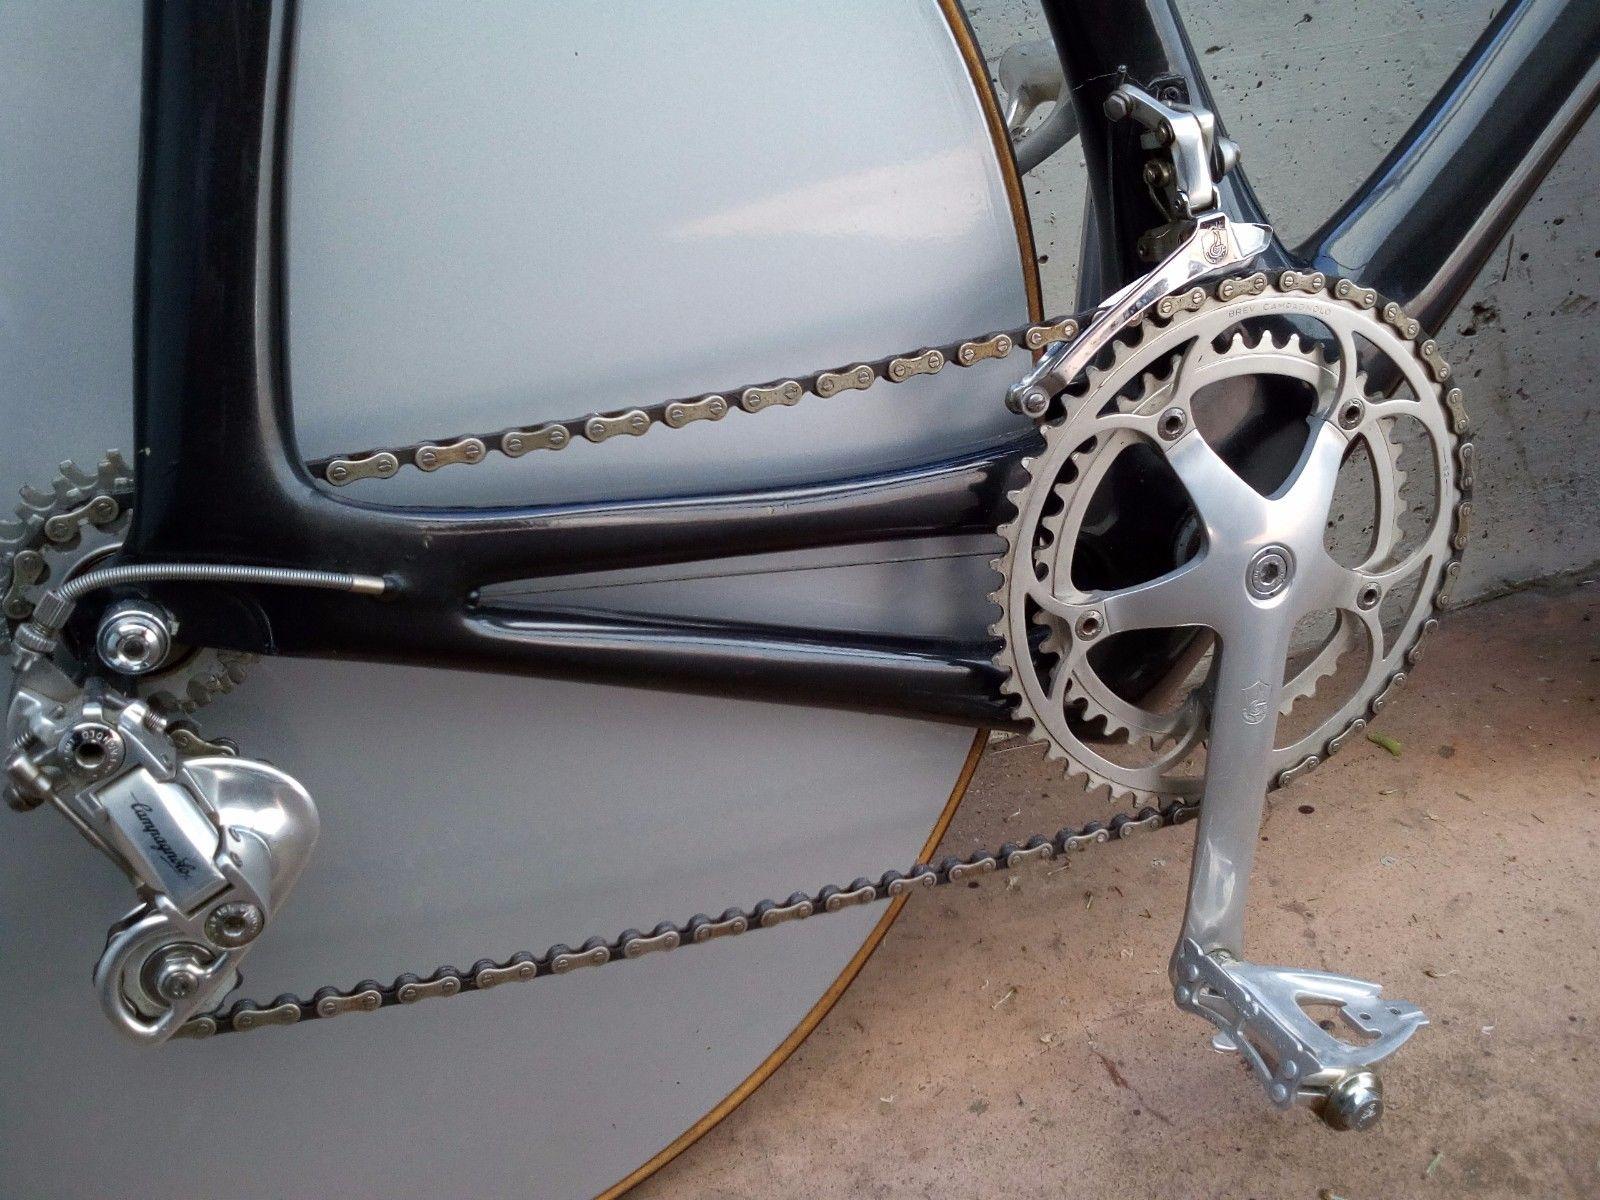 Pisenti Modular Uno Bike drivetrain